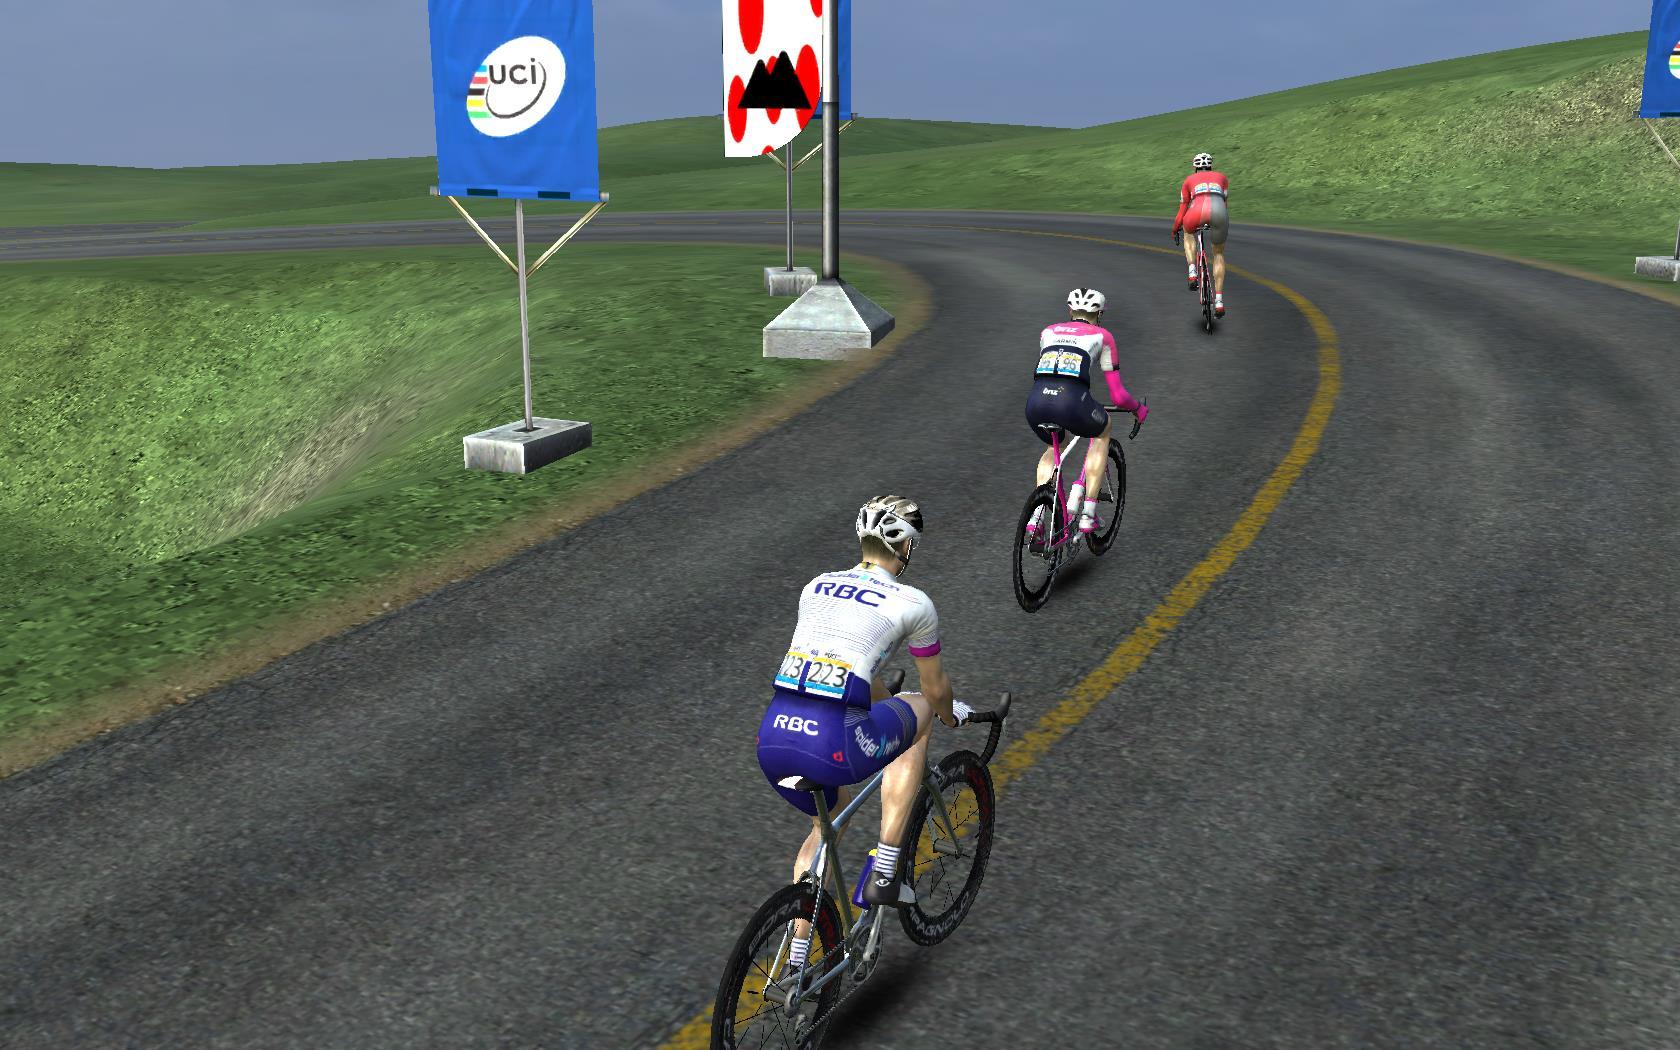 pcmdaily.com/images/mg/2018/Races/C2/USAPCC/3/PCM0005.jpg